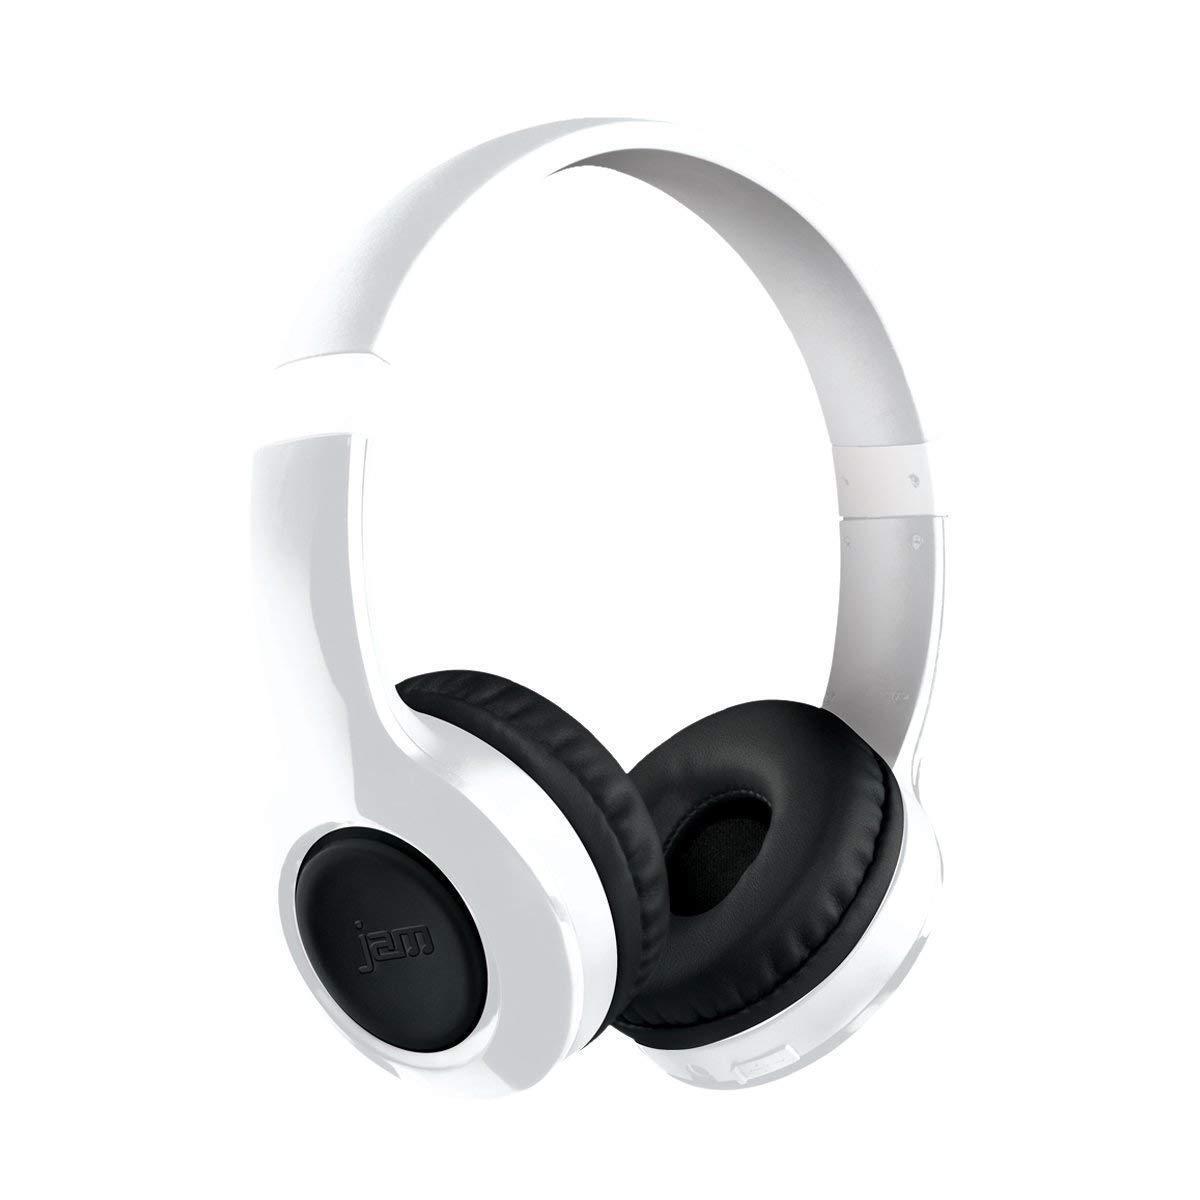 Jam Transit Bluetooth 11hr battery NEW SEALED BLACK or WHITE